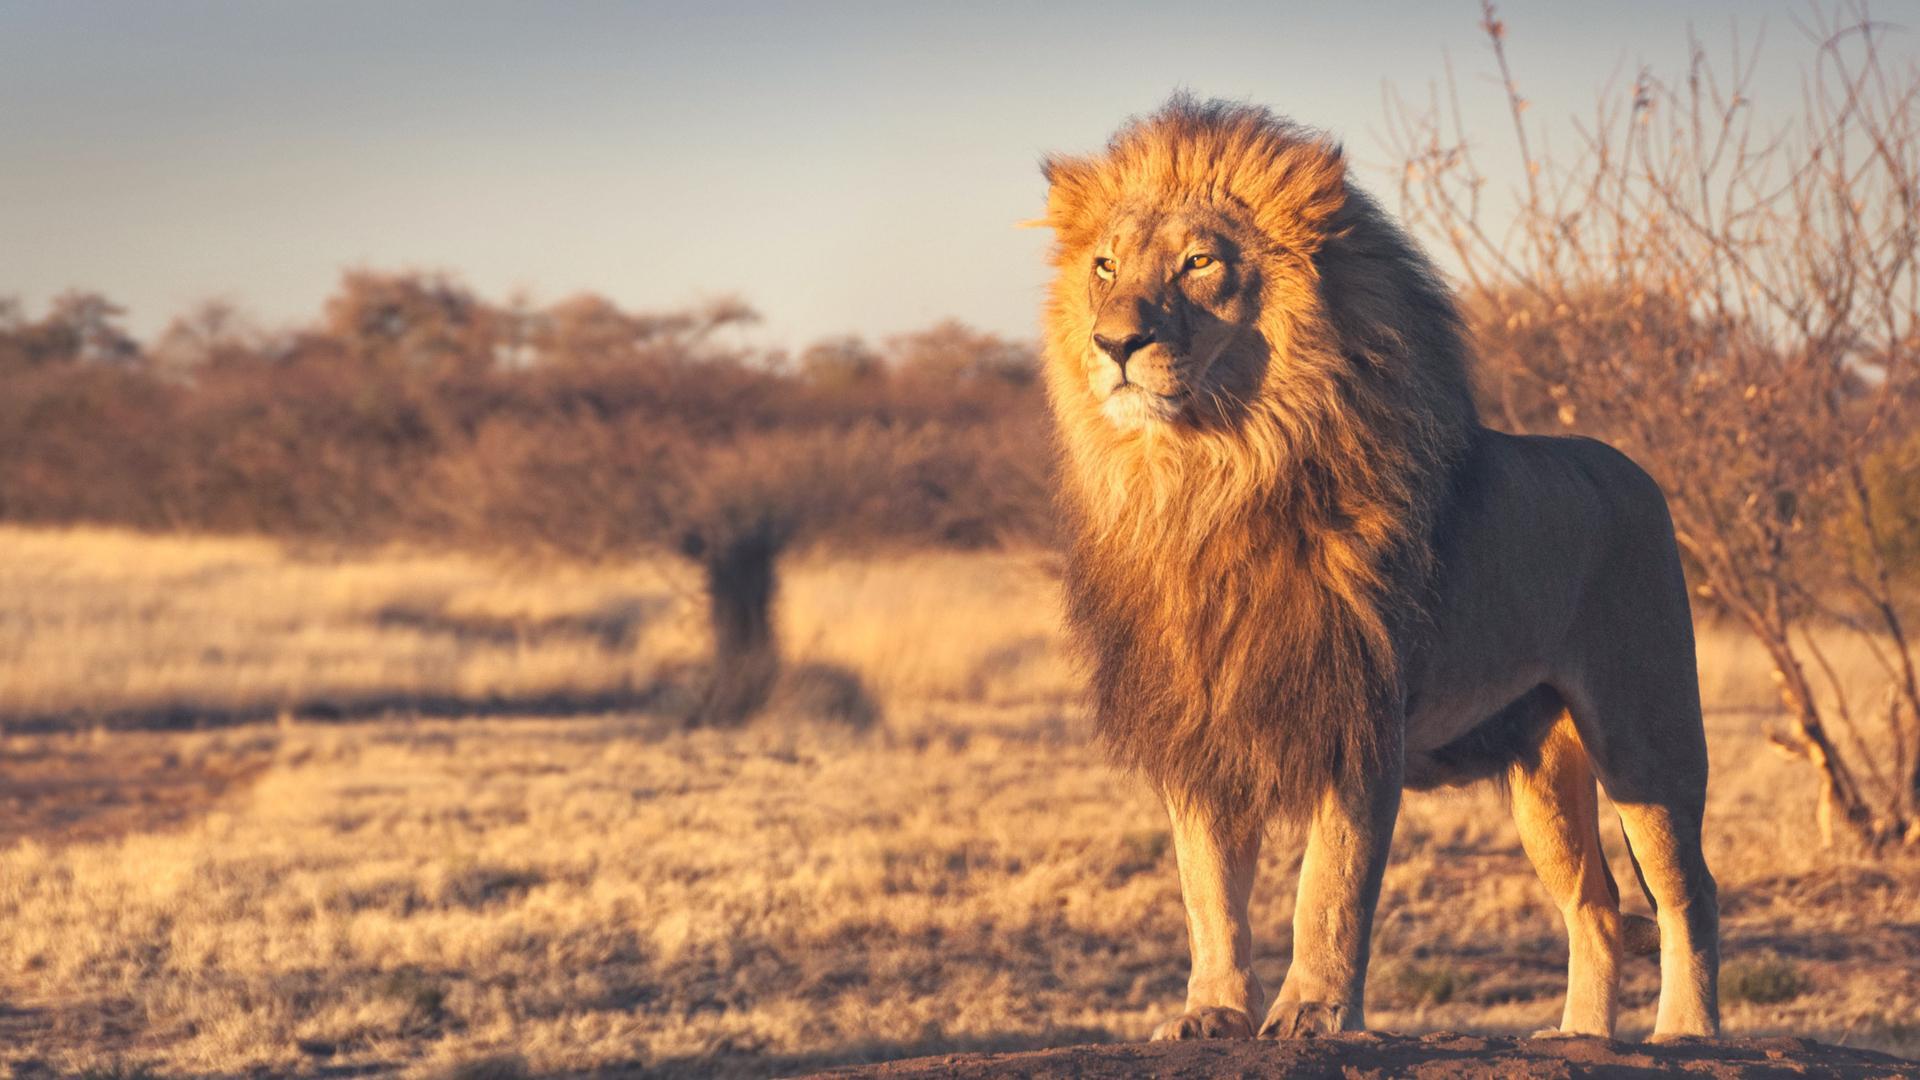 Lion 1080p Lion Background Hd 155530 Hd Wallpaper